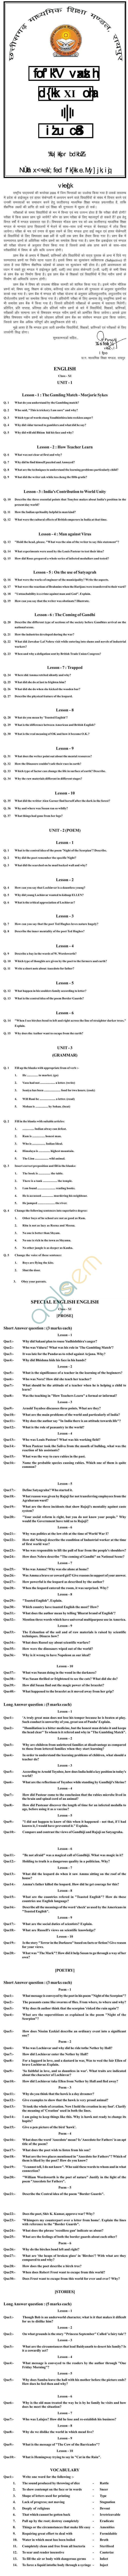 Chhattisgarh Board Class 11 Question Bank - English General